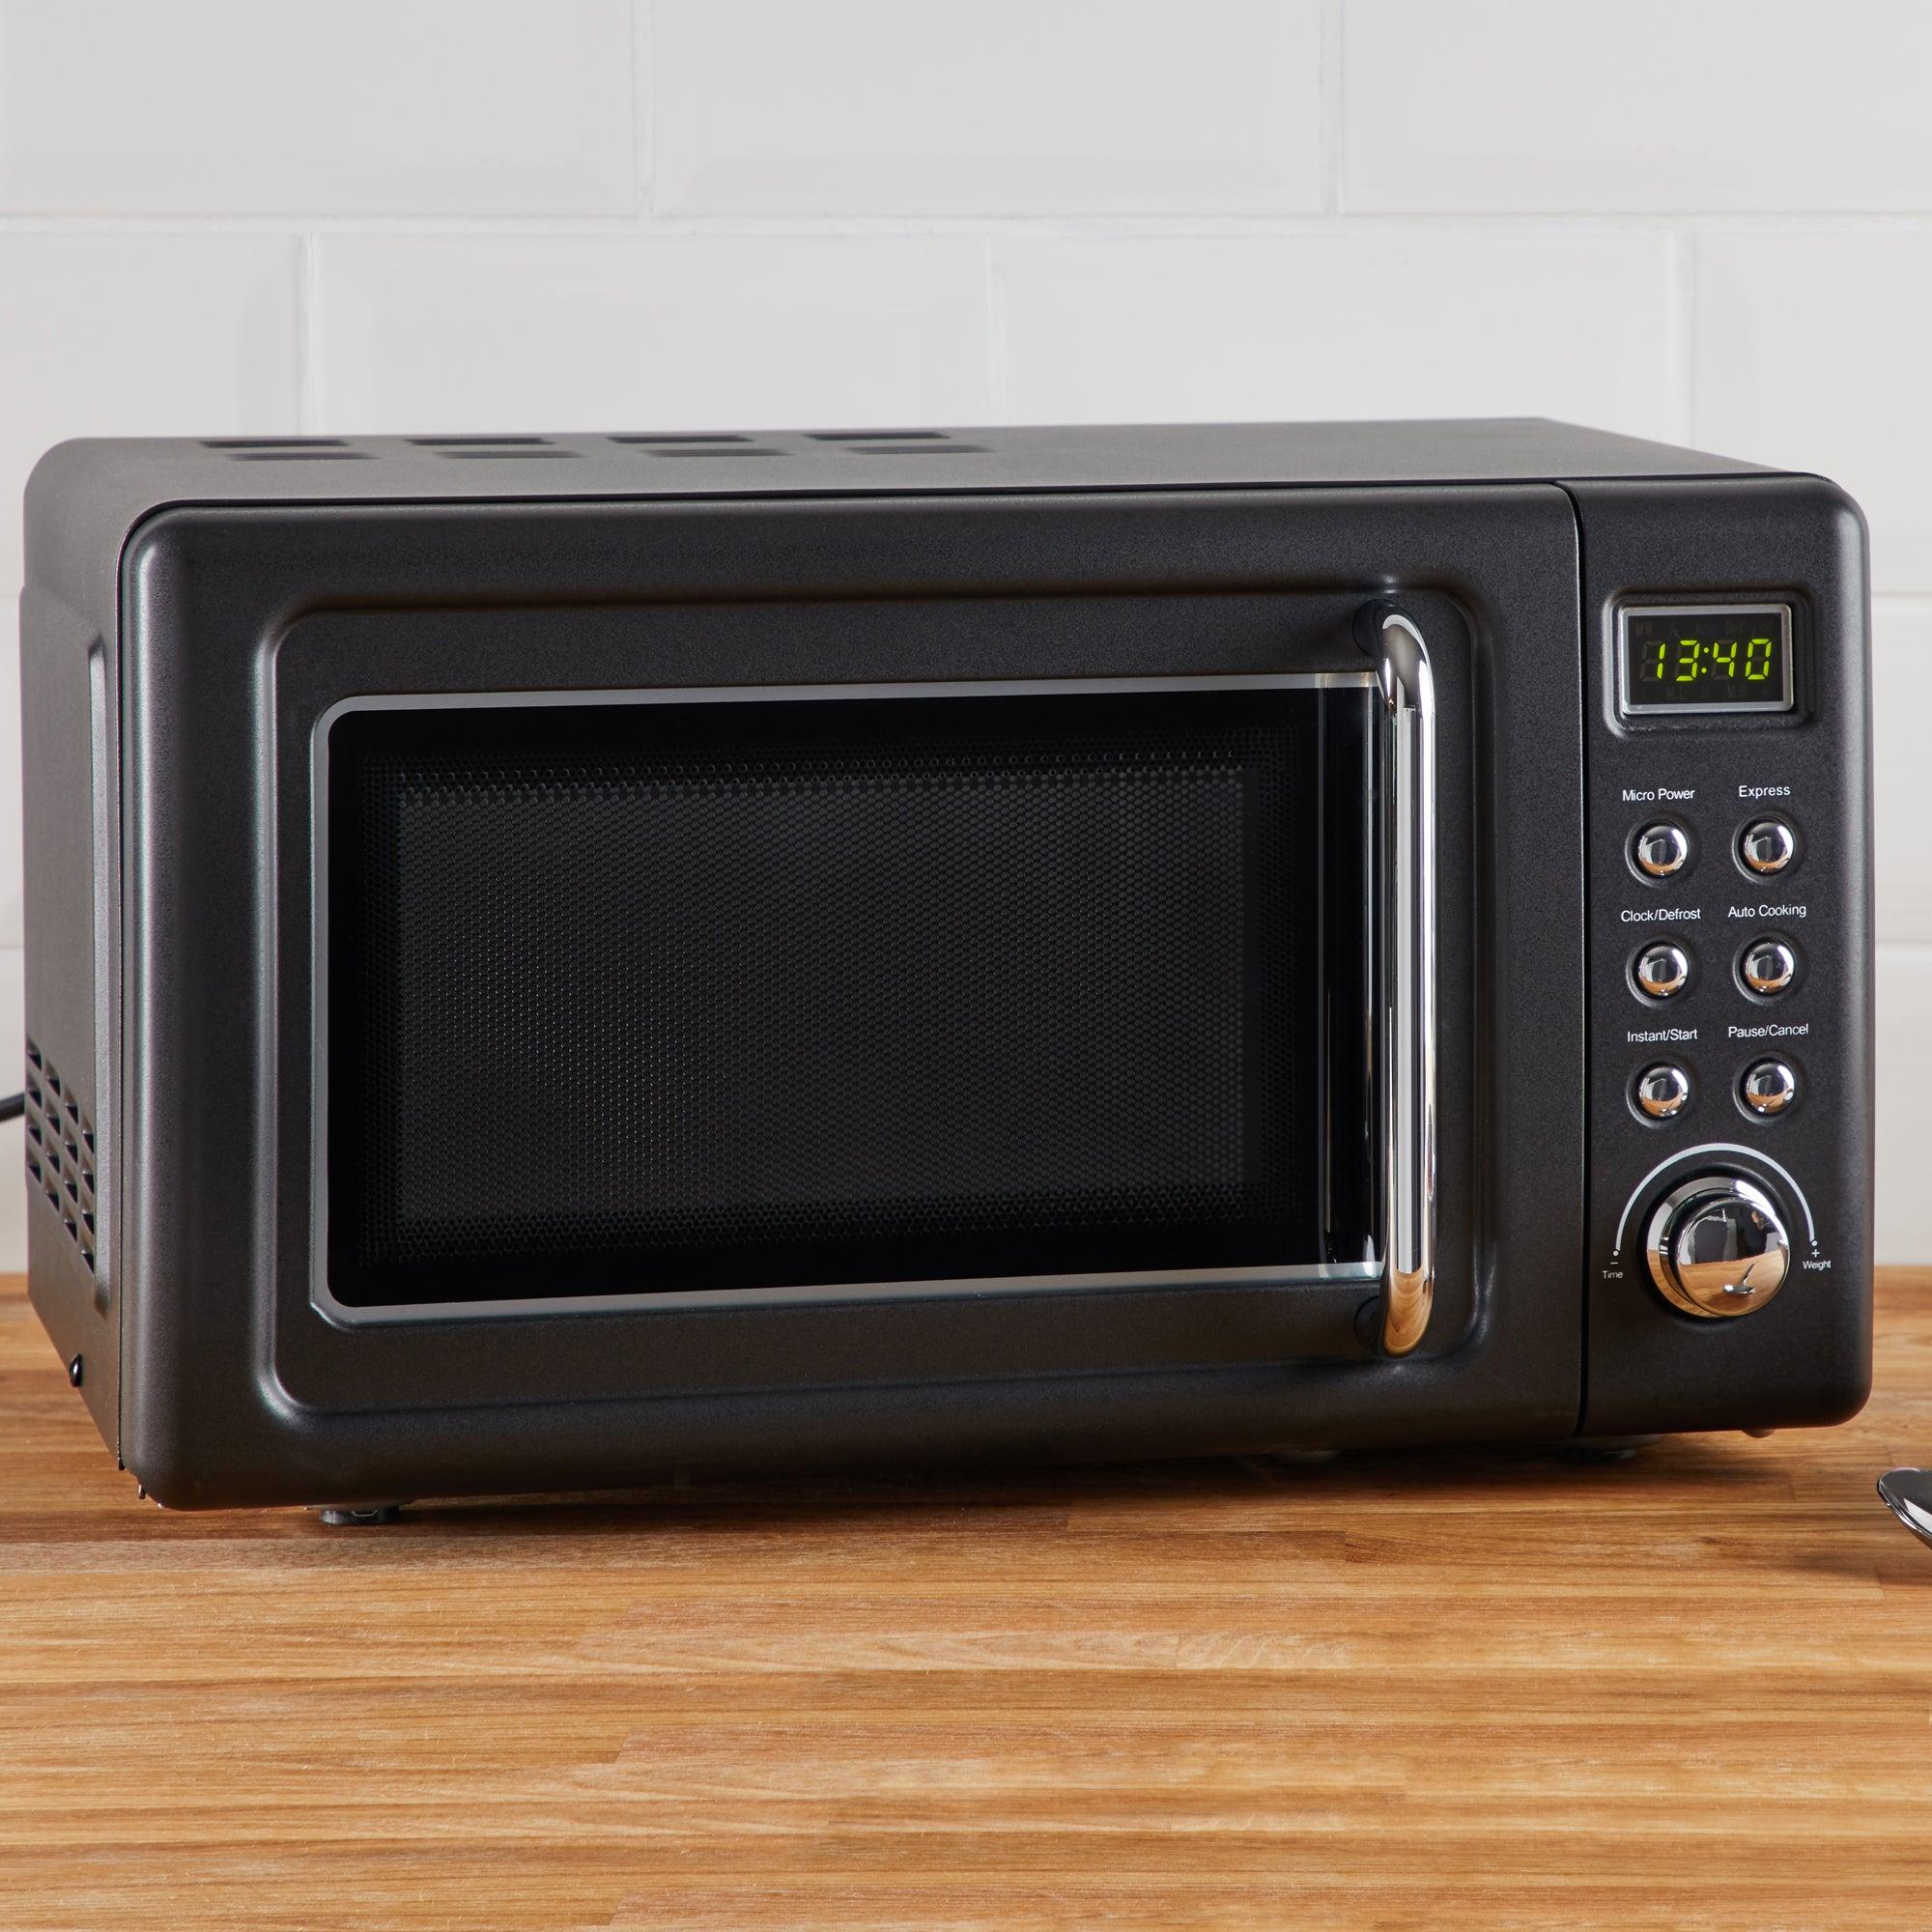 Retro 20L 800W Matt Black Microwave Black